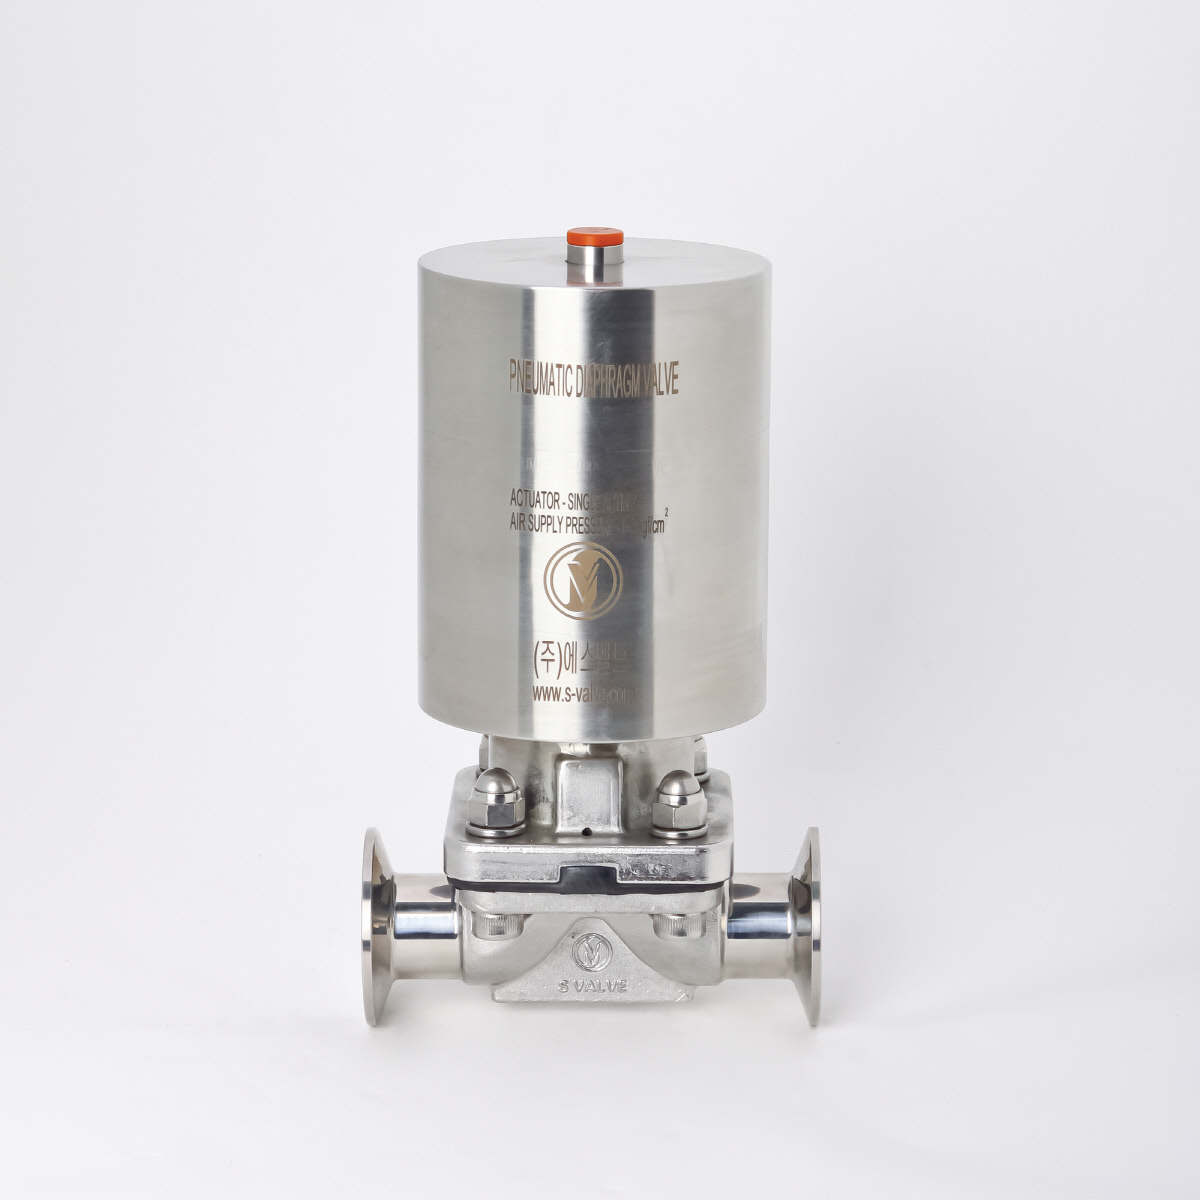 S-valve_0025.jpg